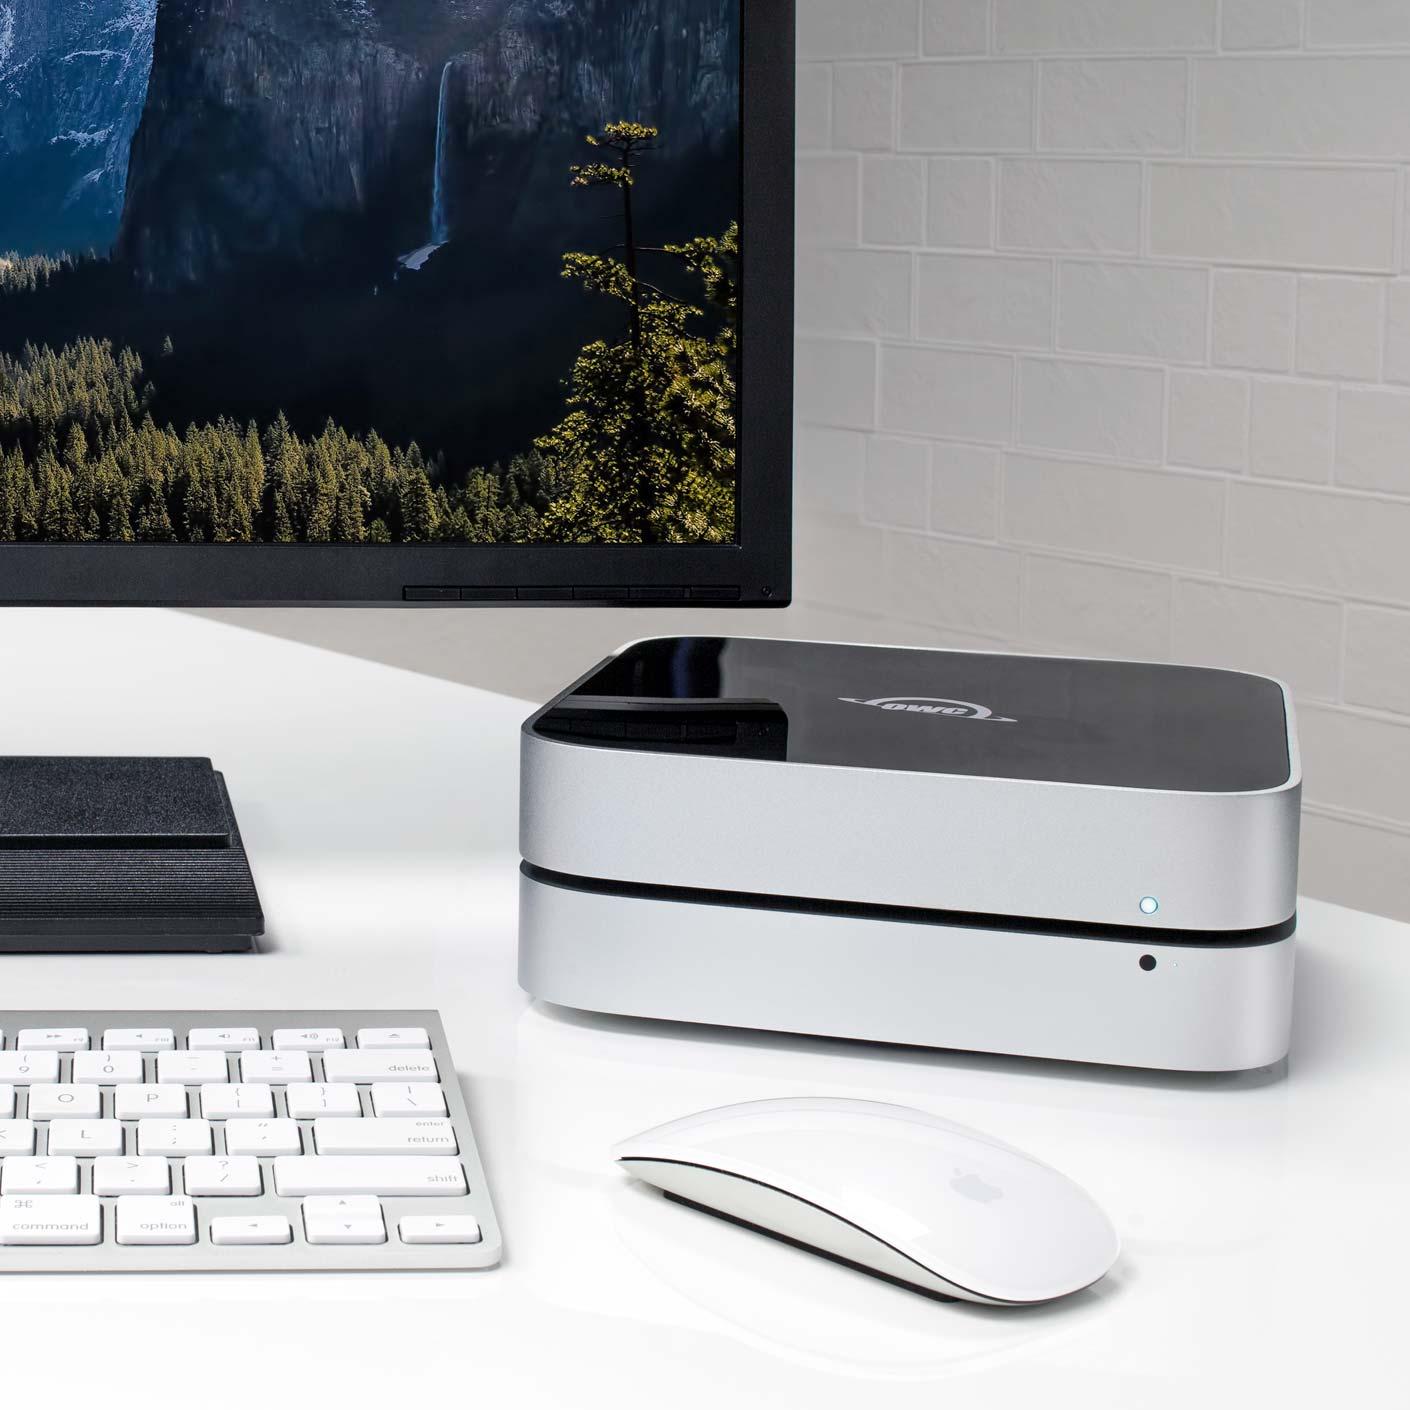 OWC miniStack - The External Drive with a Mac mini Footprint